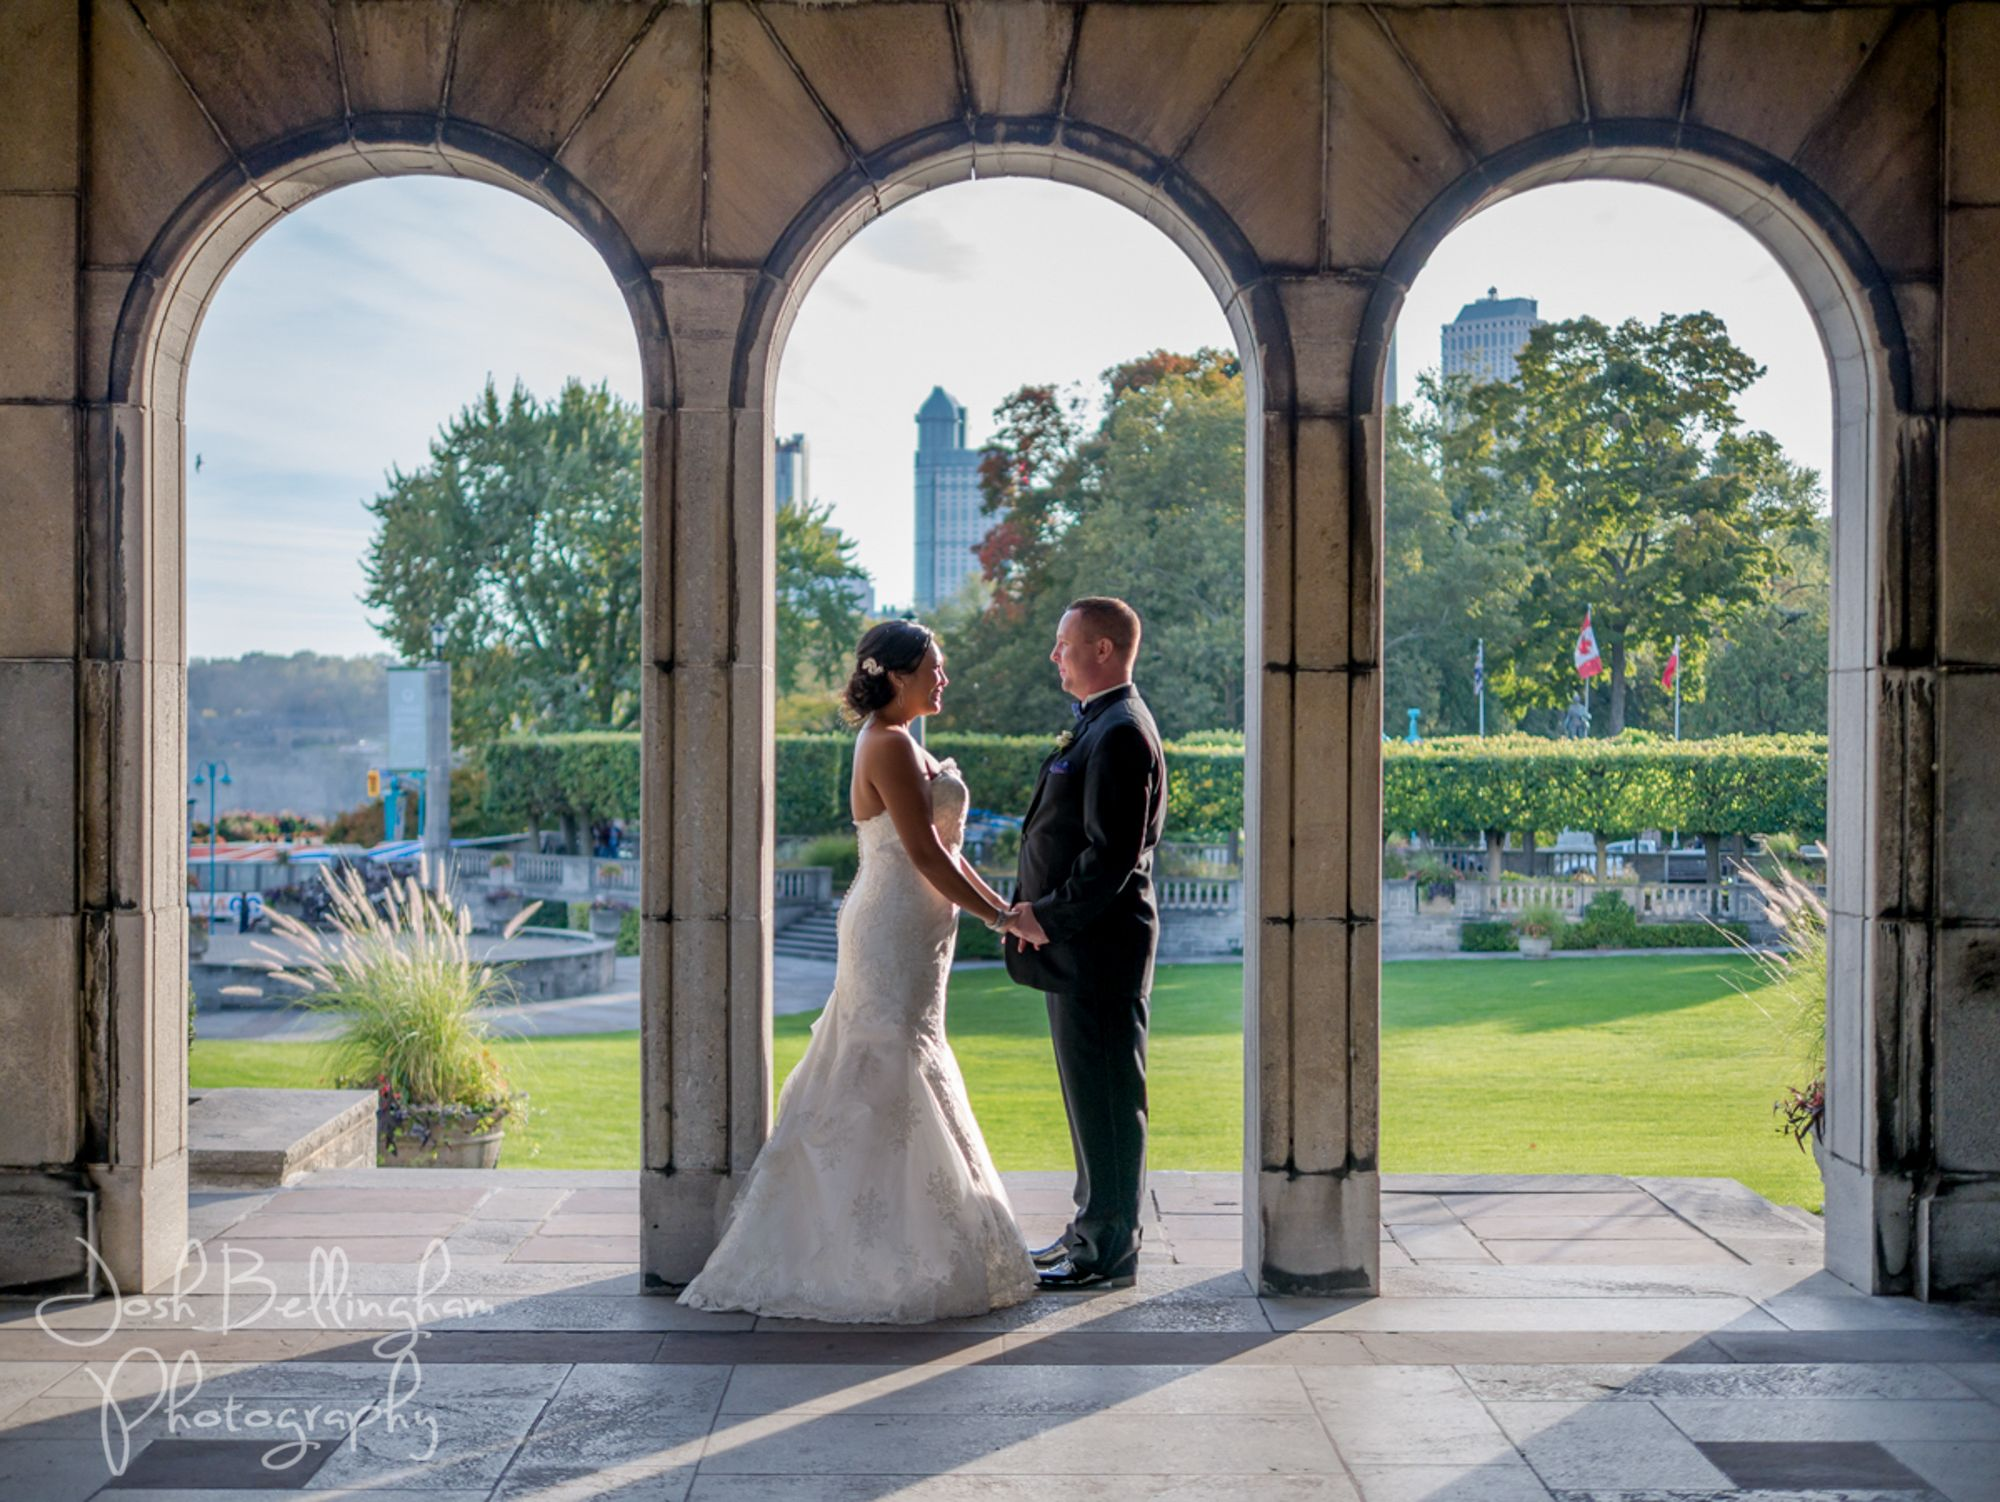 Stunning Wedding Couple Shot With Niagara Falls As The Backdrop Taken At Niagara Falls Wedding Photography Niagara Falls Wedding Niagara Wedding Photographer